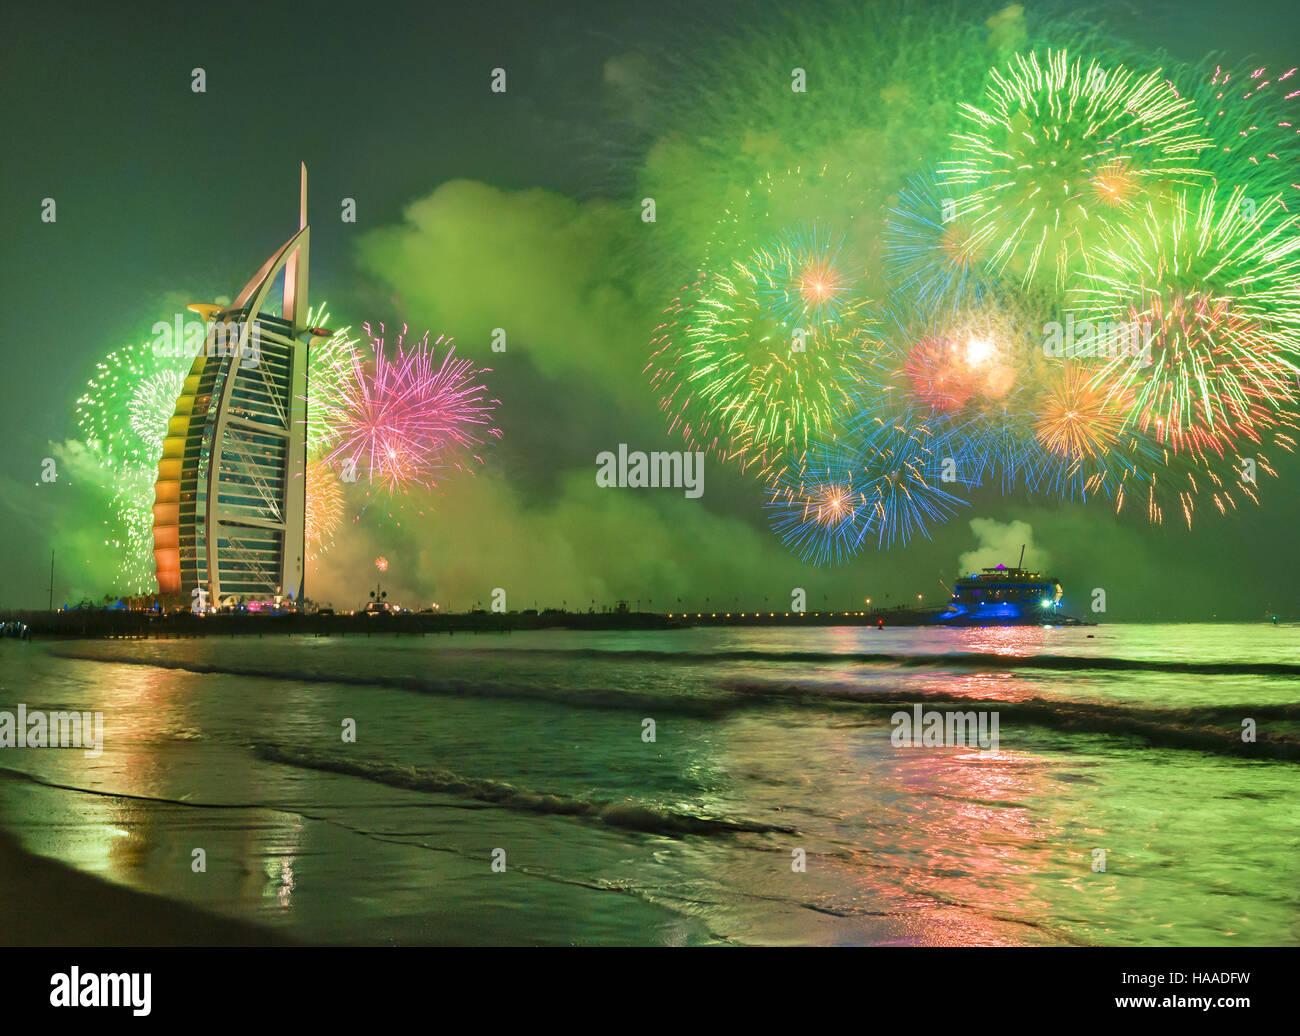 El Burj Al Arab en Dubai Jumeirah Beach celebarating la víspera de año nuevo Imagen De Stock